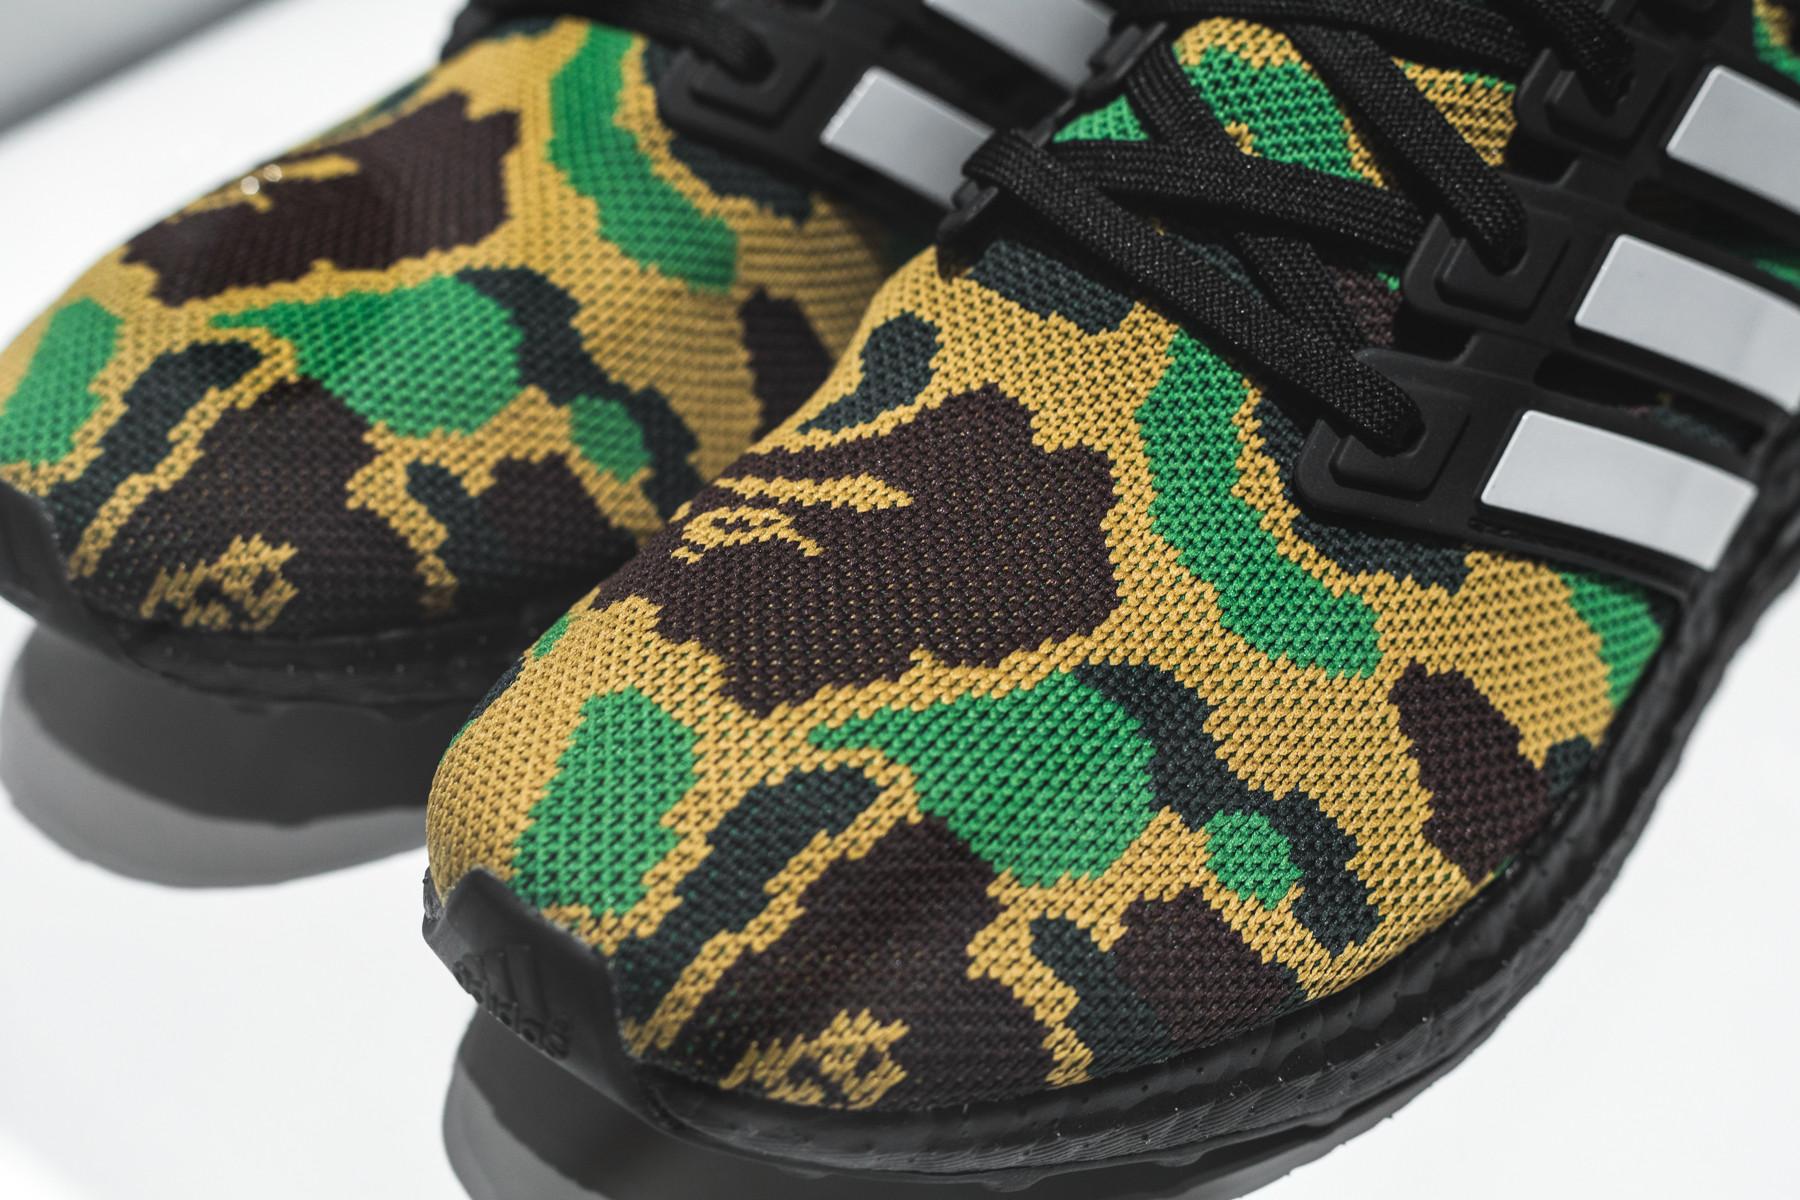 Bape_adidas_2.jpg